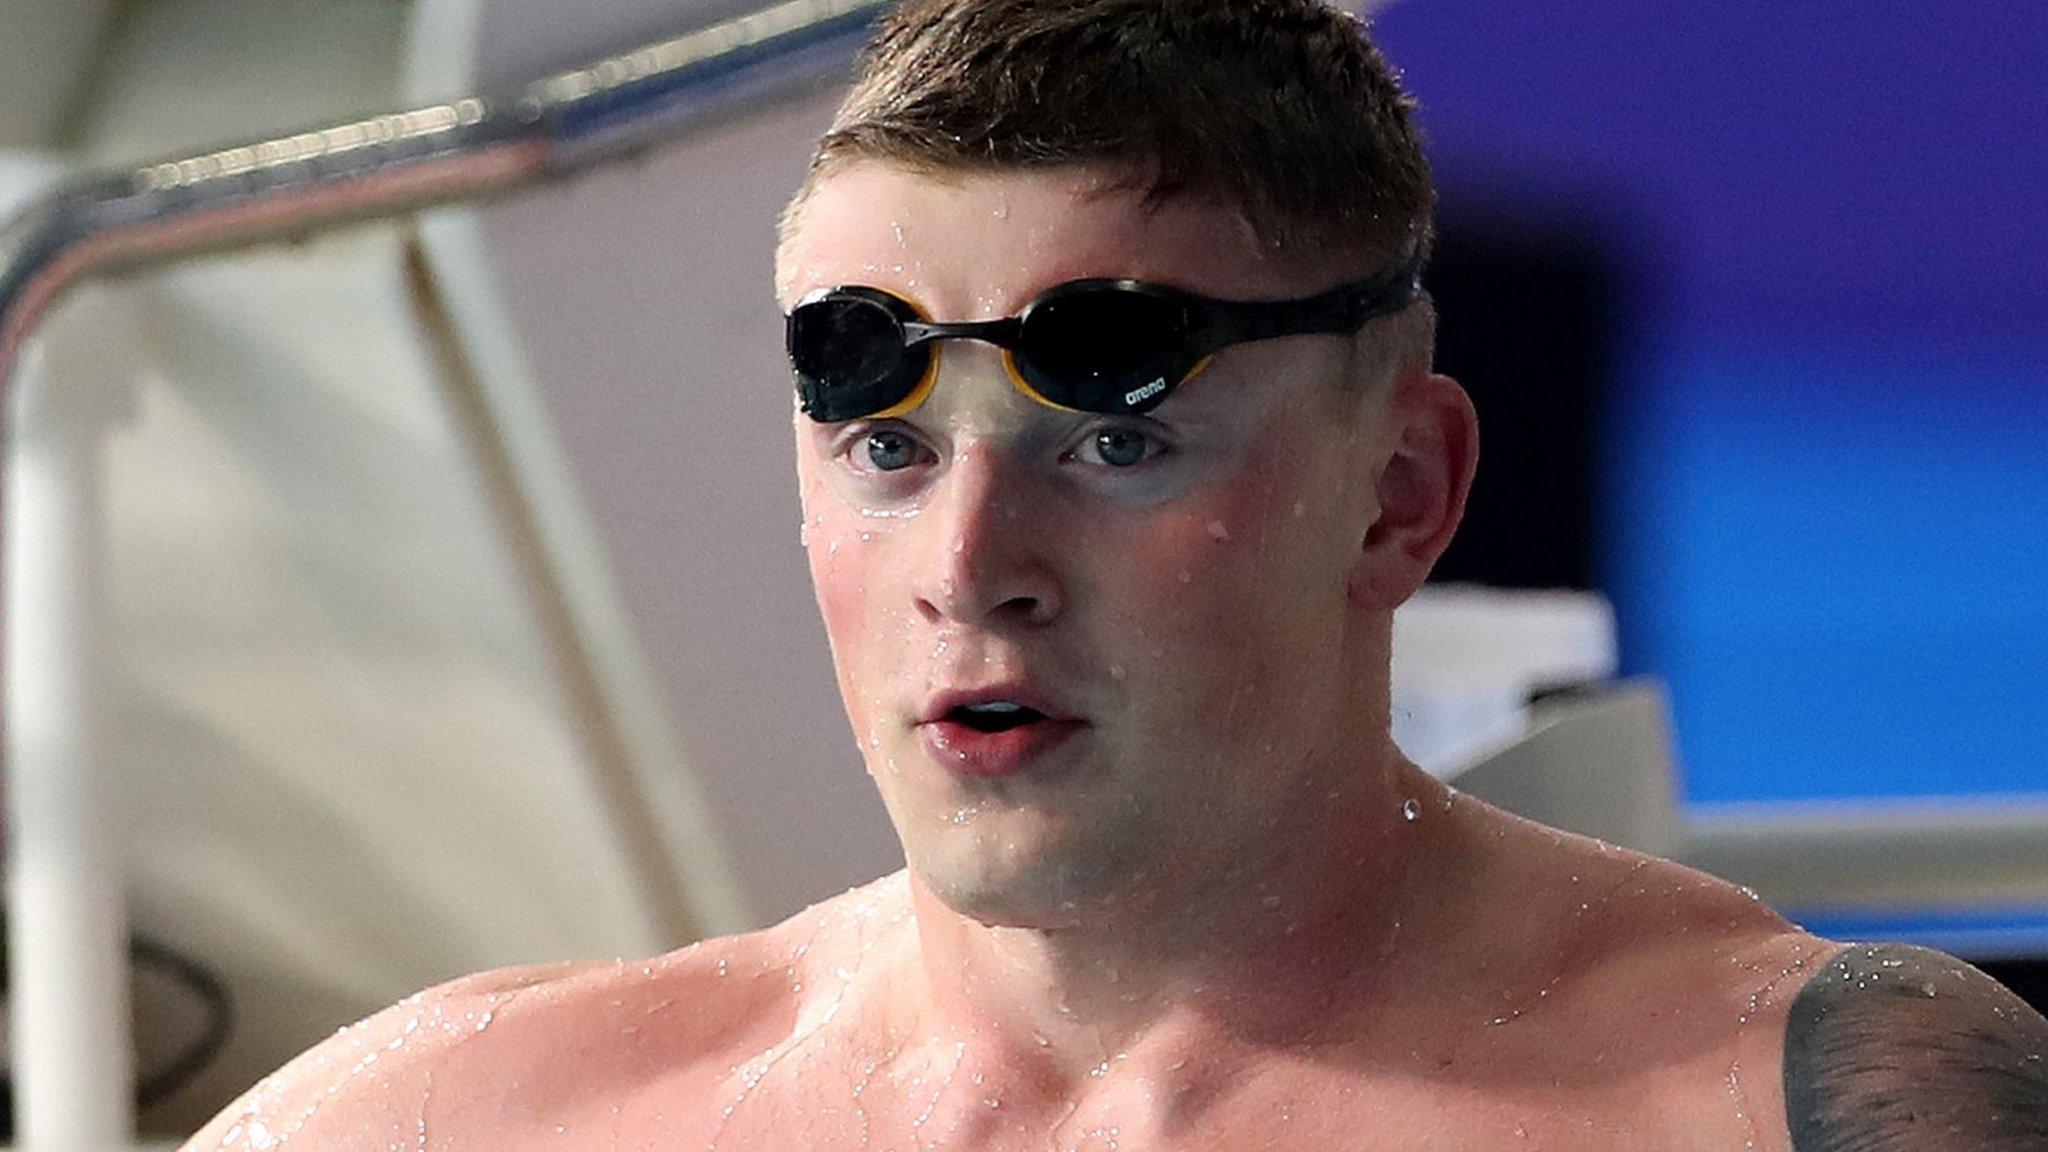 Adam Peaty: Olympic champion to skip inaugural Fina Champions Swim Series to focus on World Championships